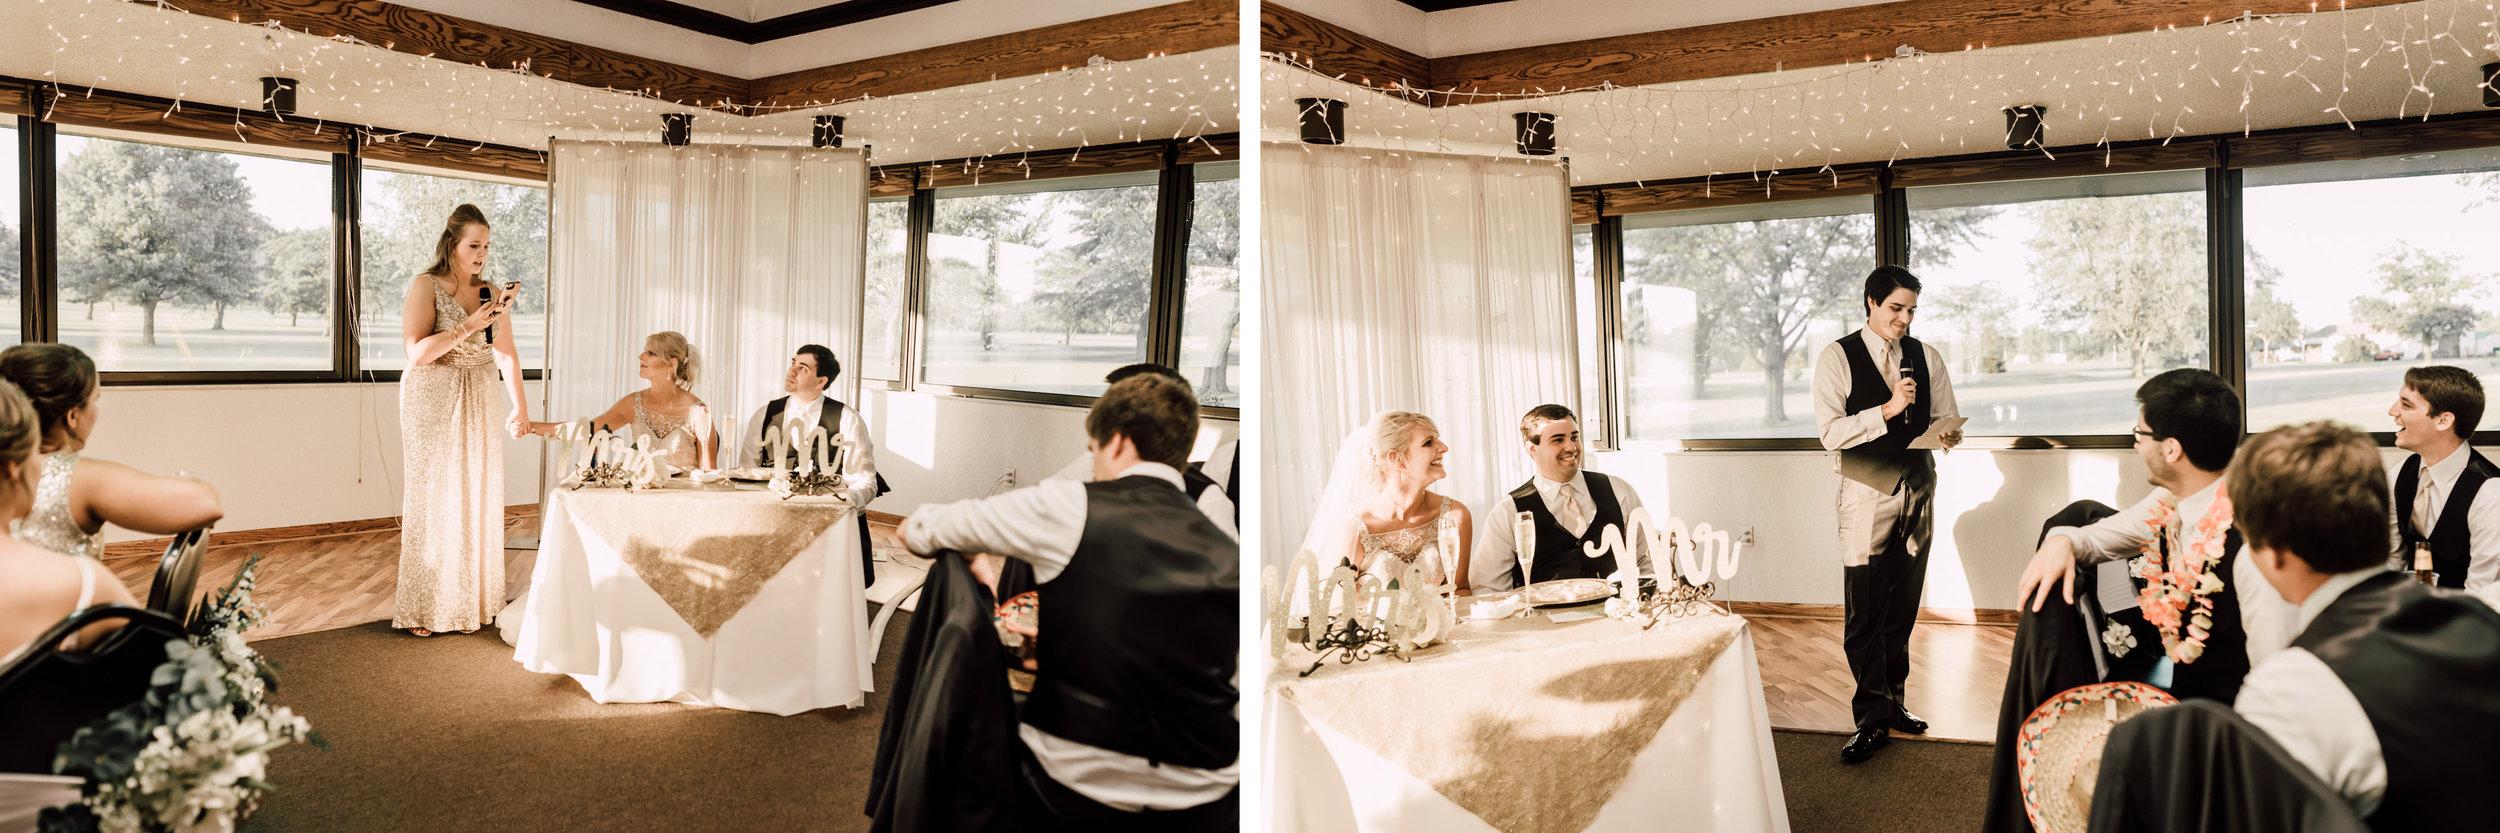 bridal speeches, bridesmaid speech, groomsmen speech